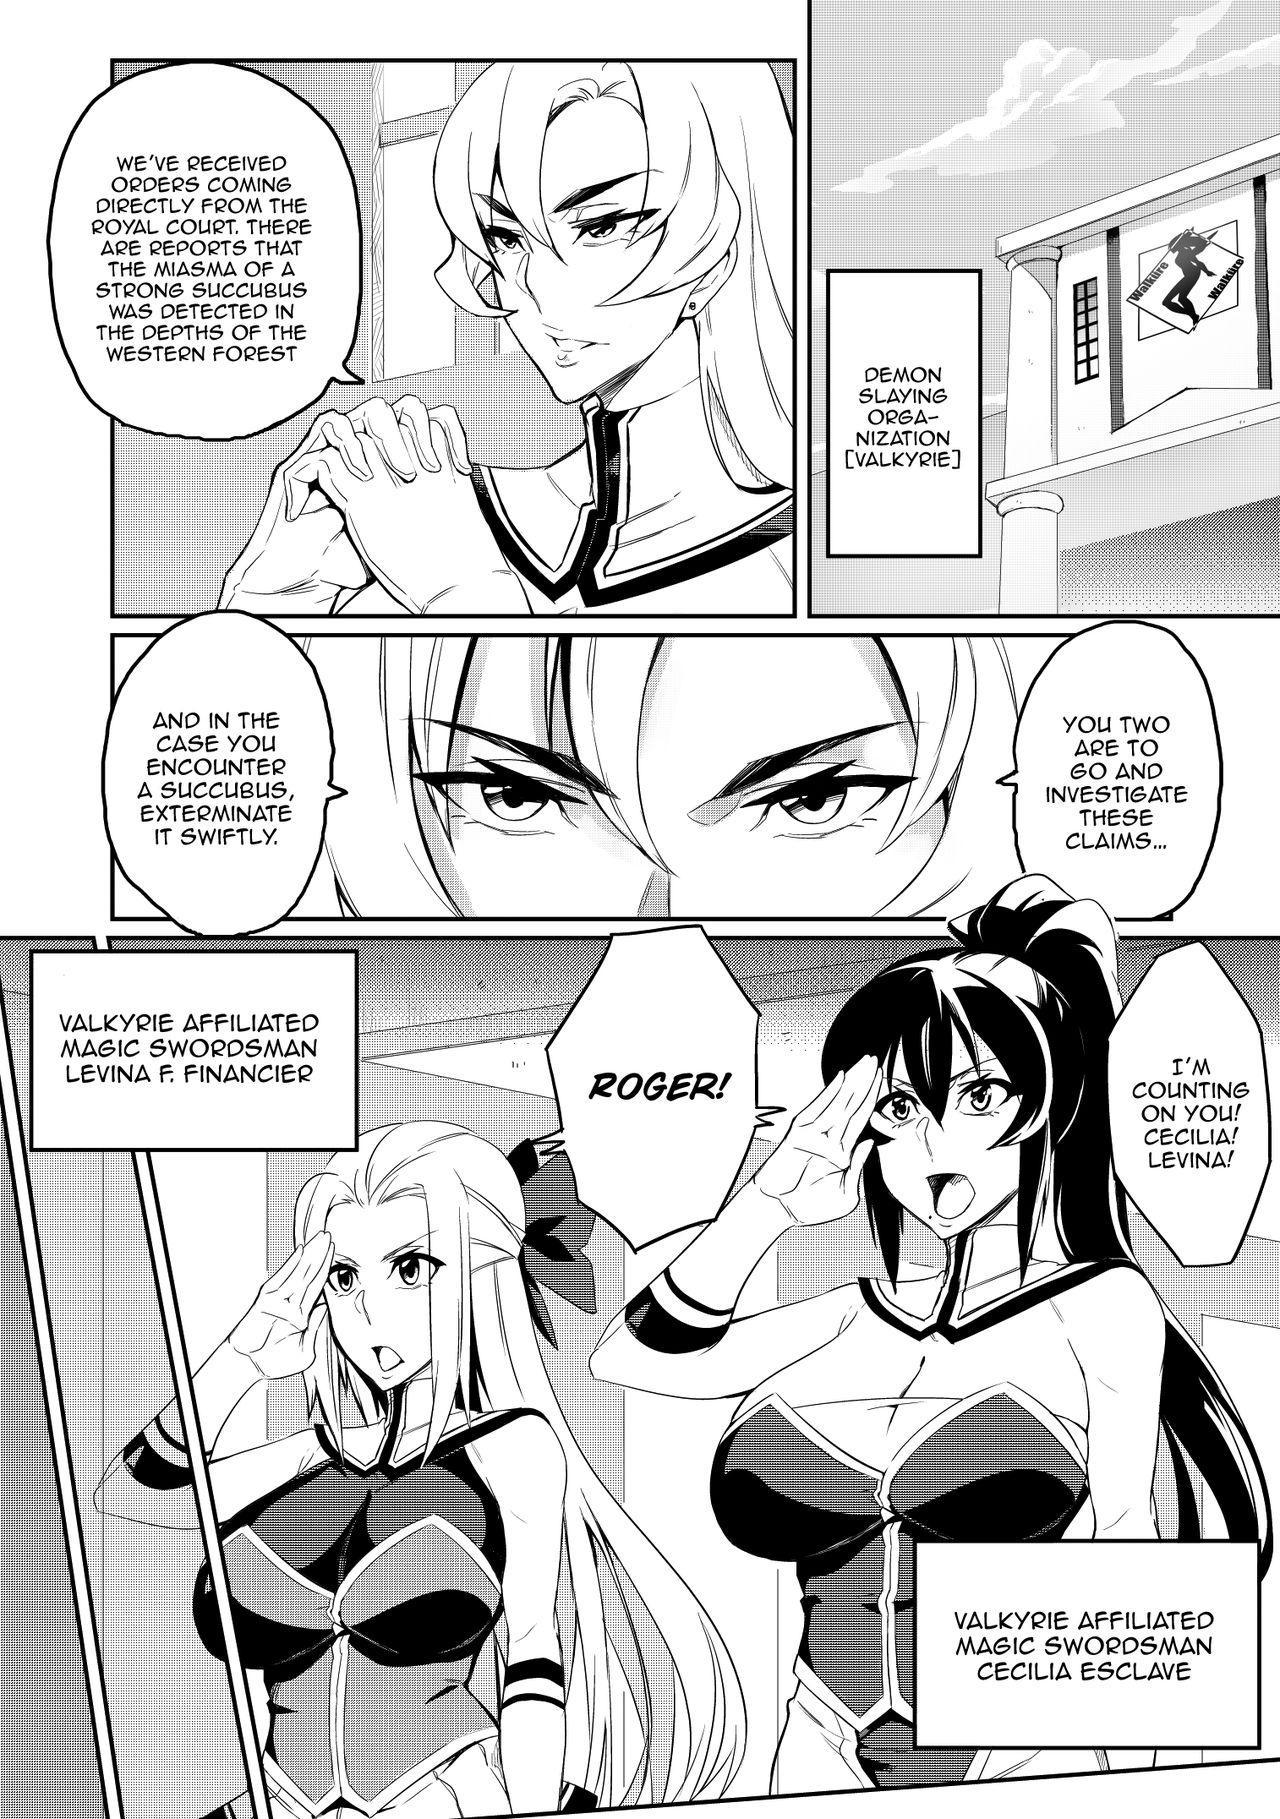 [Hatoba Akane] Demon Slaying Battle Princess Cecilia Ch. 1-8   Touma Senki Cecilia Ch. 1-8 [English] {EL JEFE Hentai Truck} 2